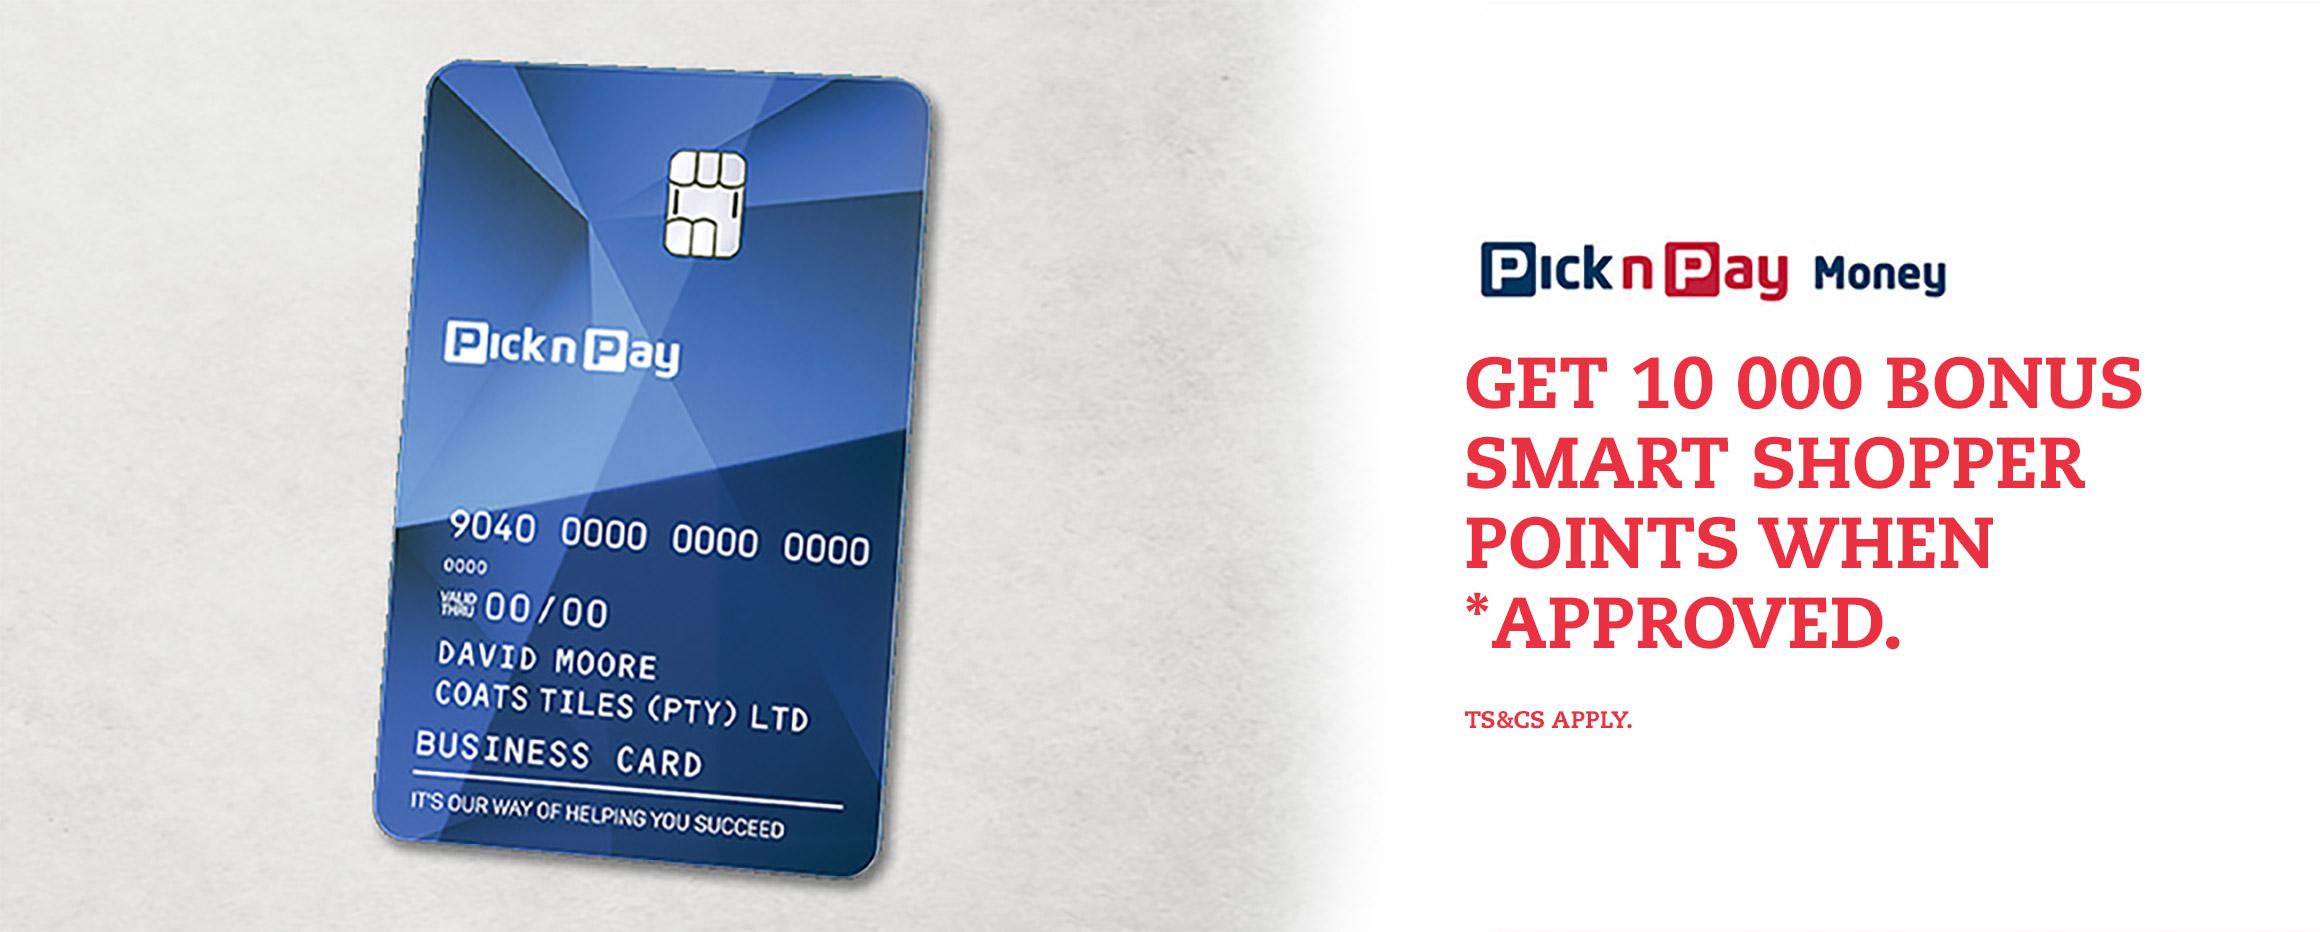 Get 10 000 bonus smart shopper points when approved